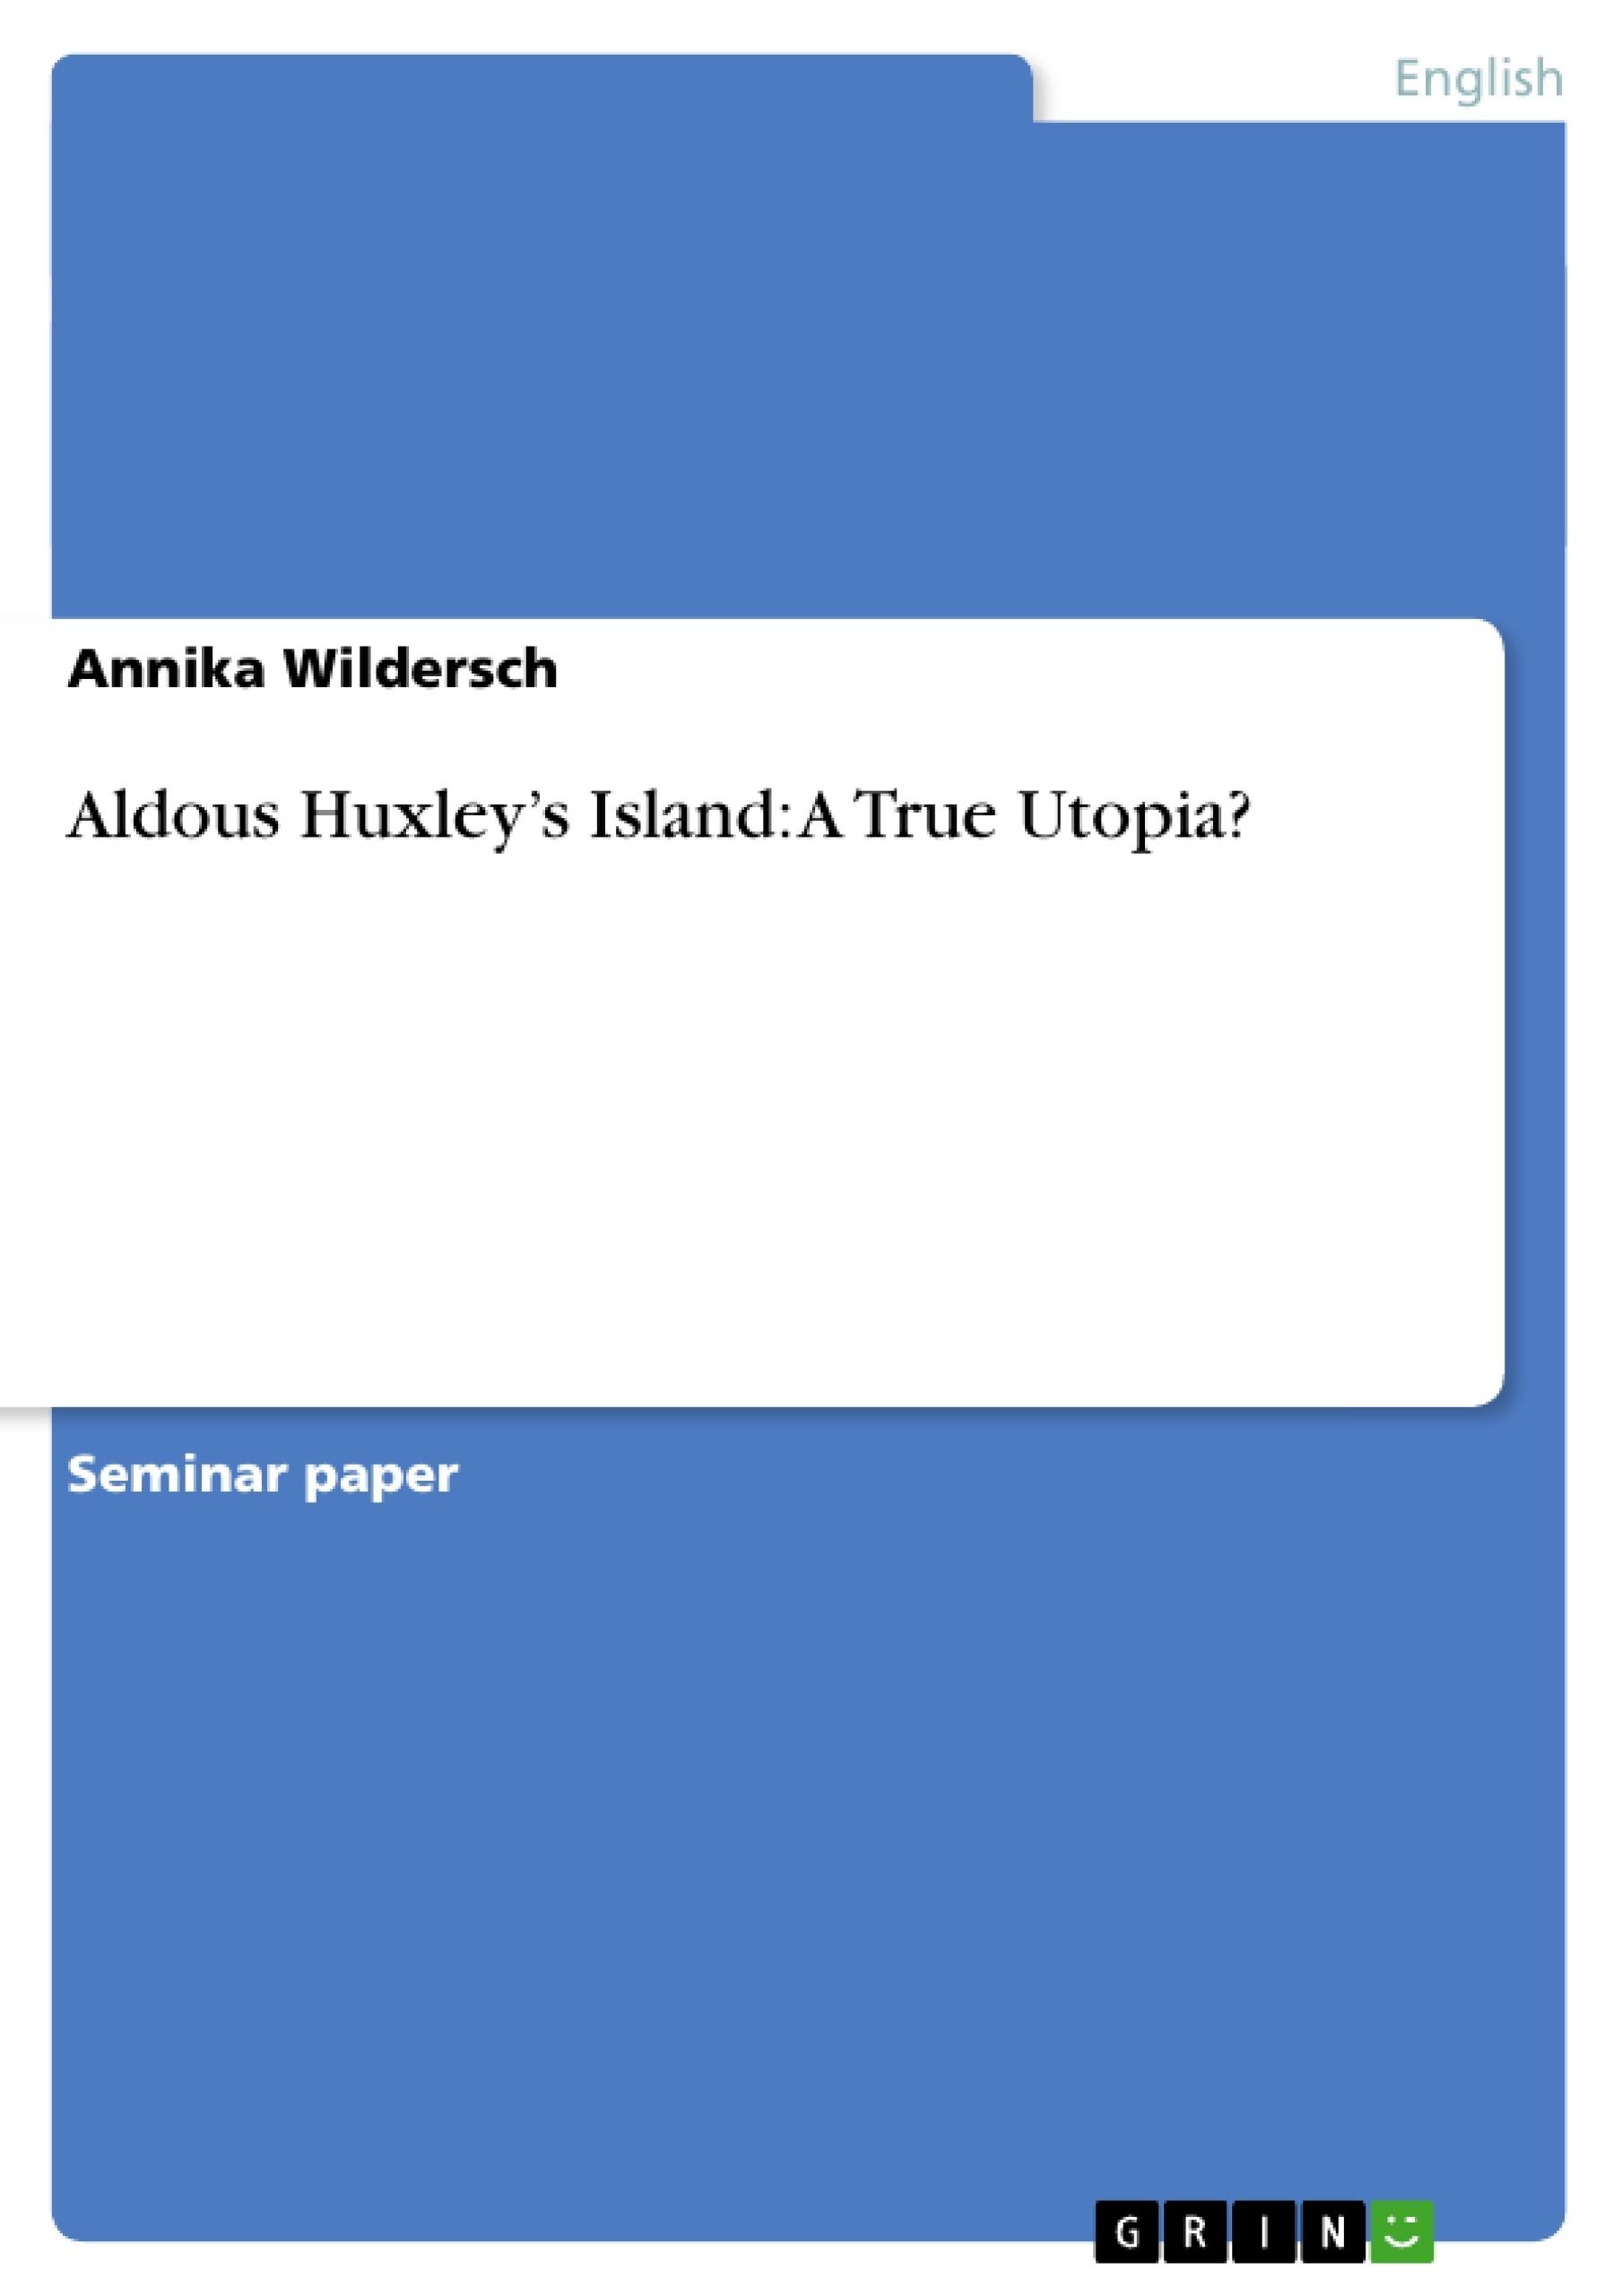 Title: Aldous Huxley's Island:  A True Utopia?